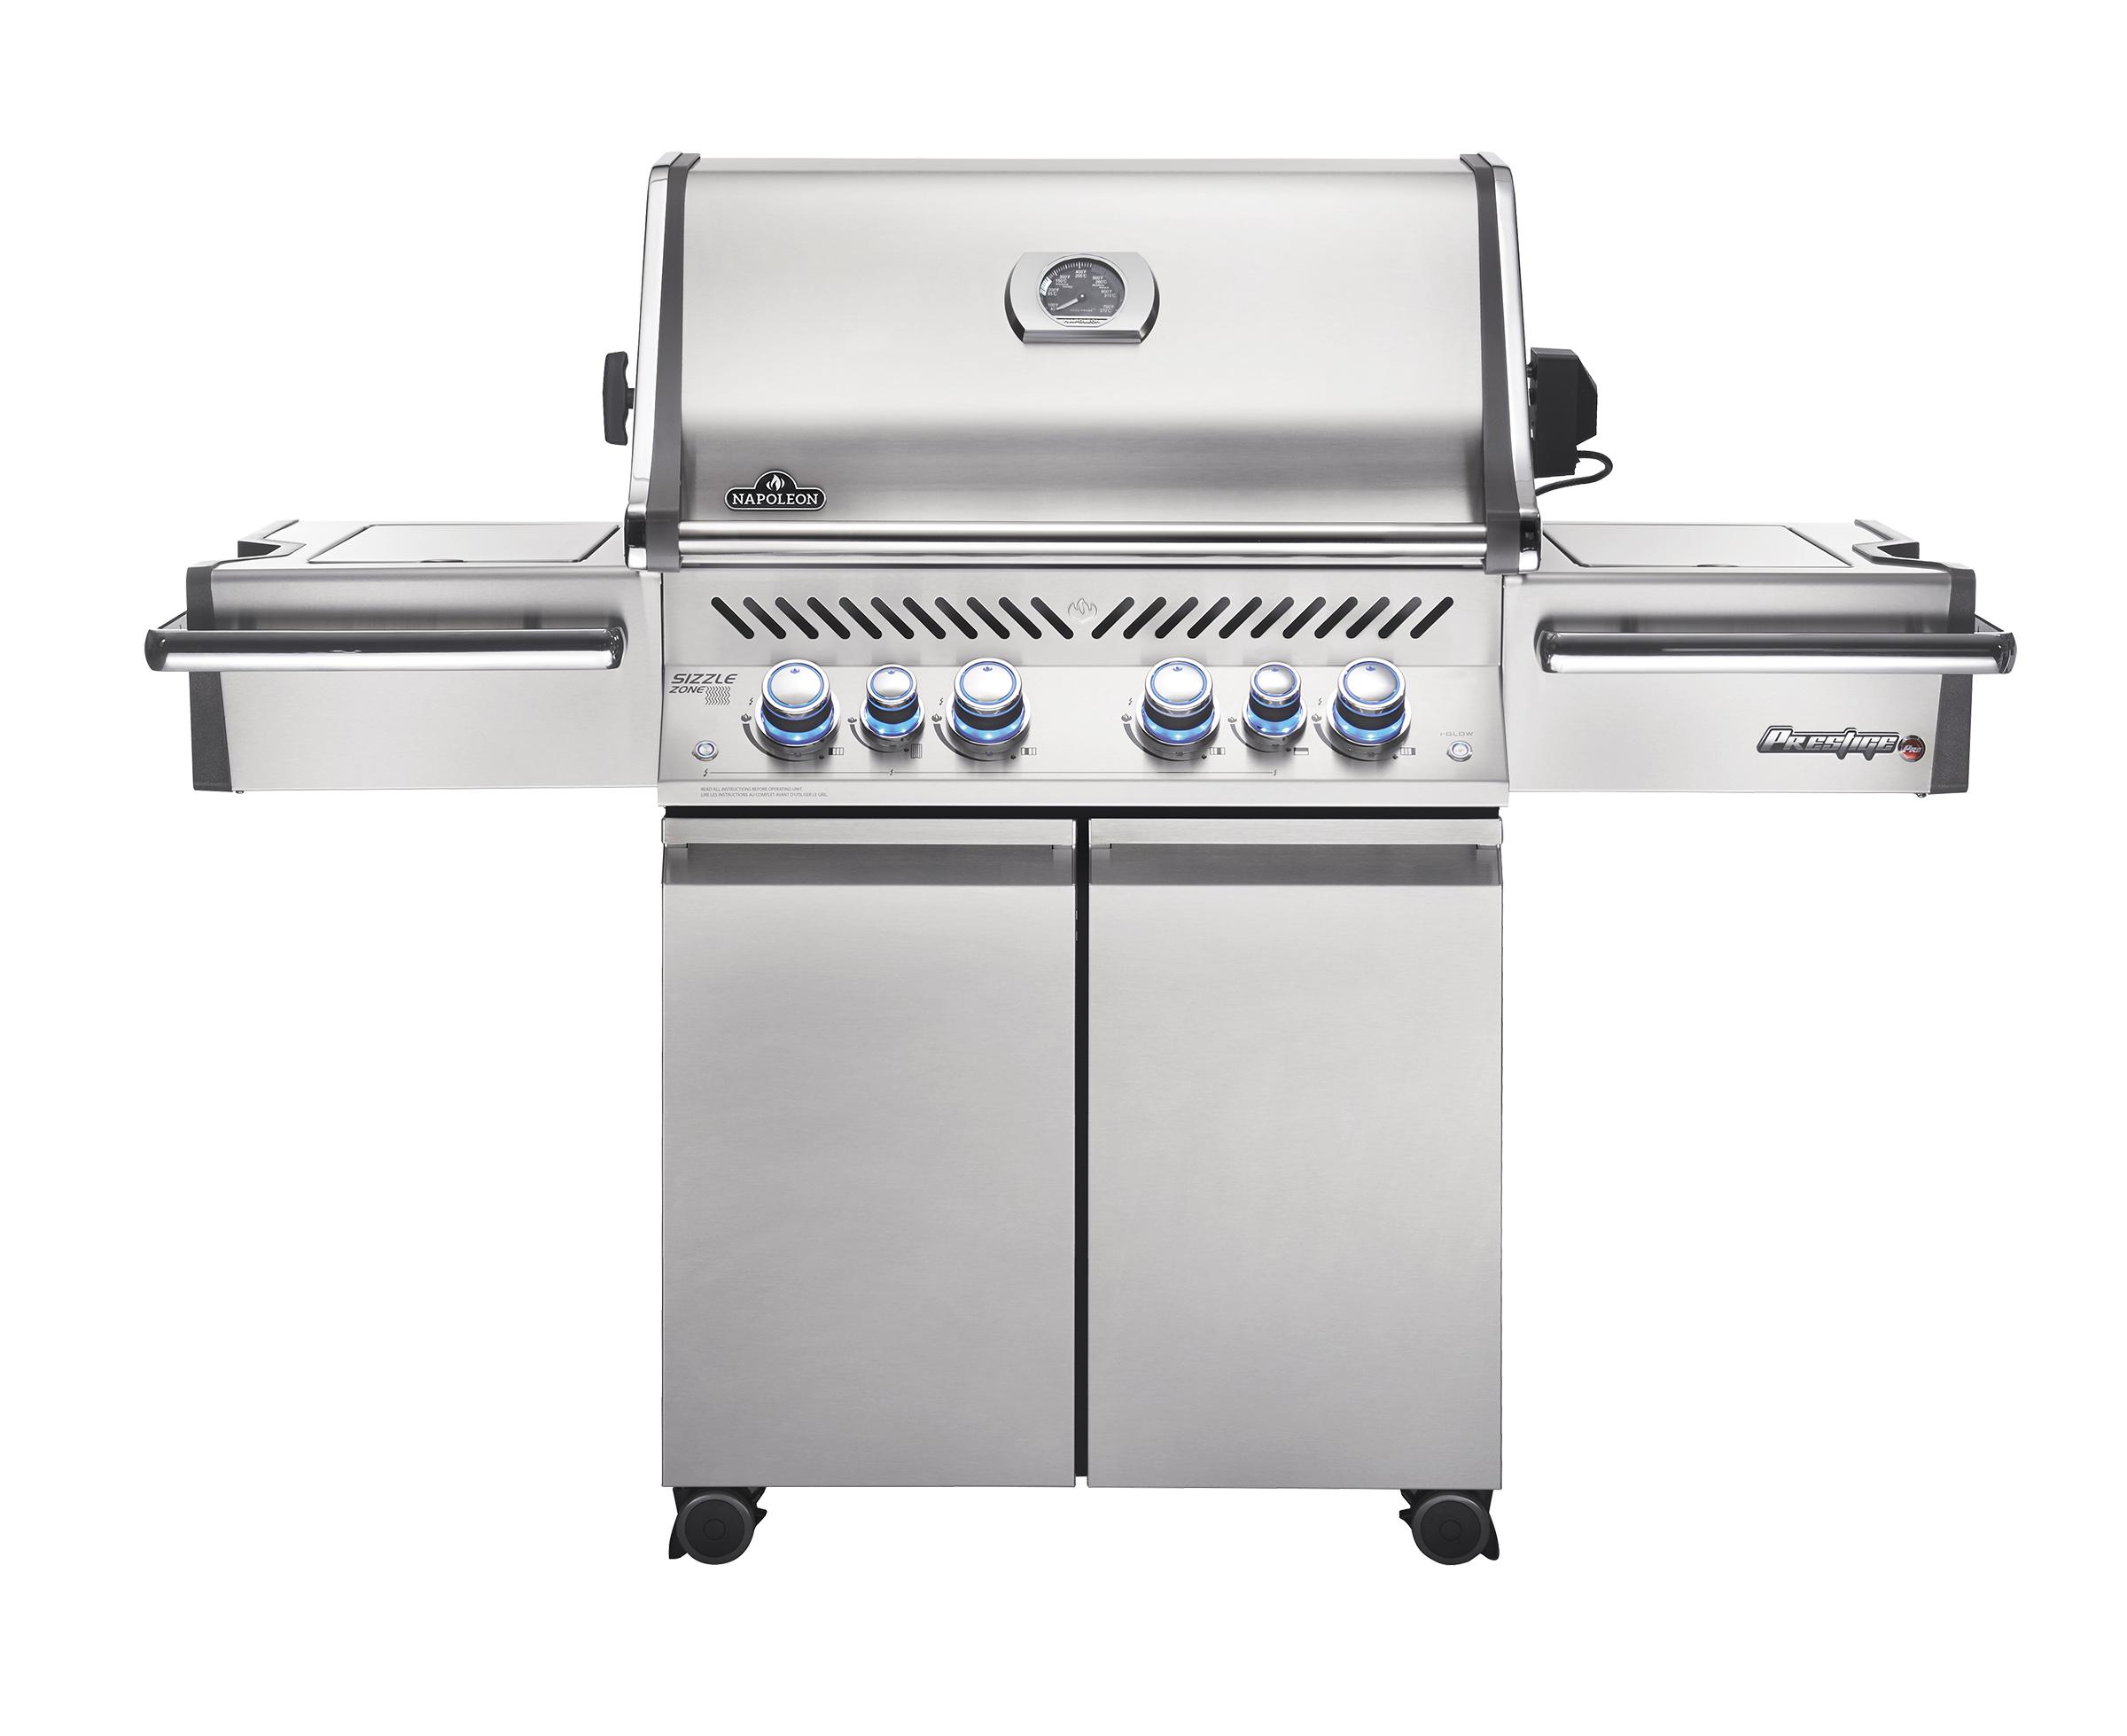 Outdoor Küche Edelstahl Napoleon : Gasgrill prestige pro™ 500 edelstahl gasgrill grill & bbq